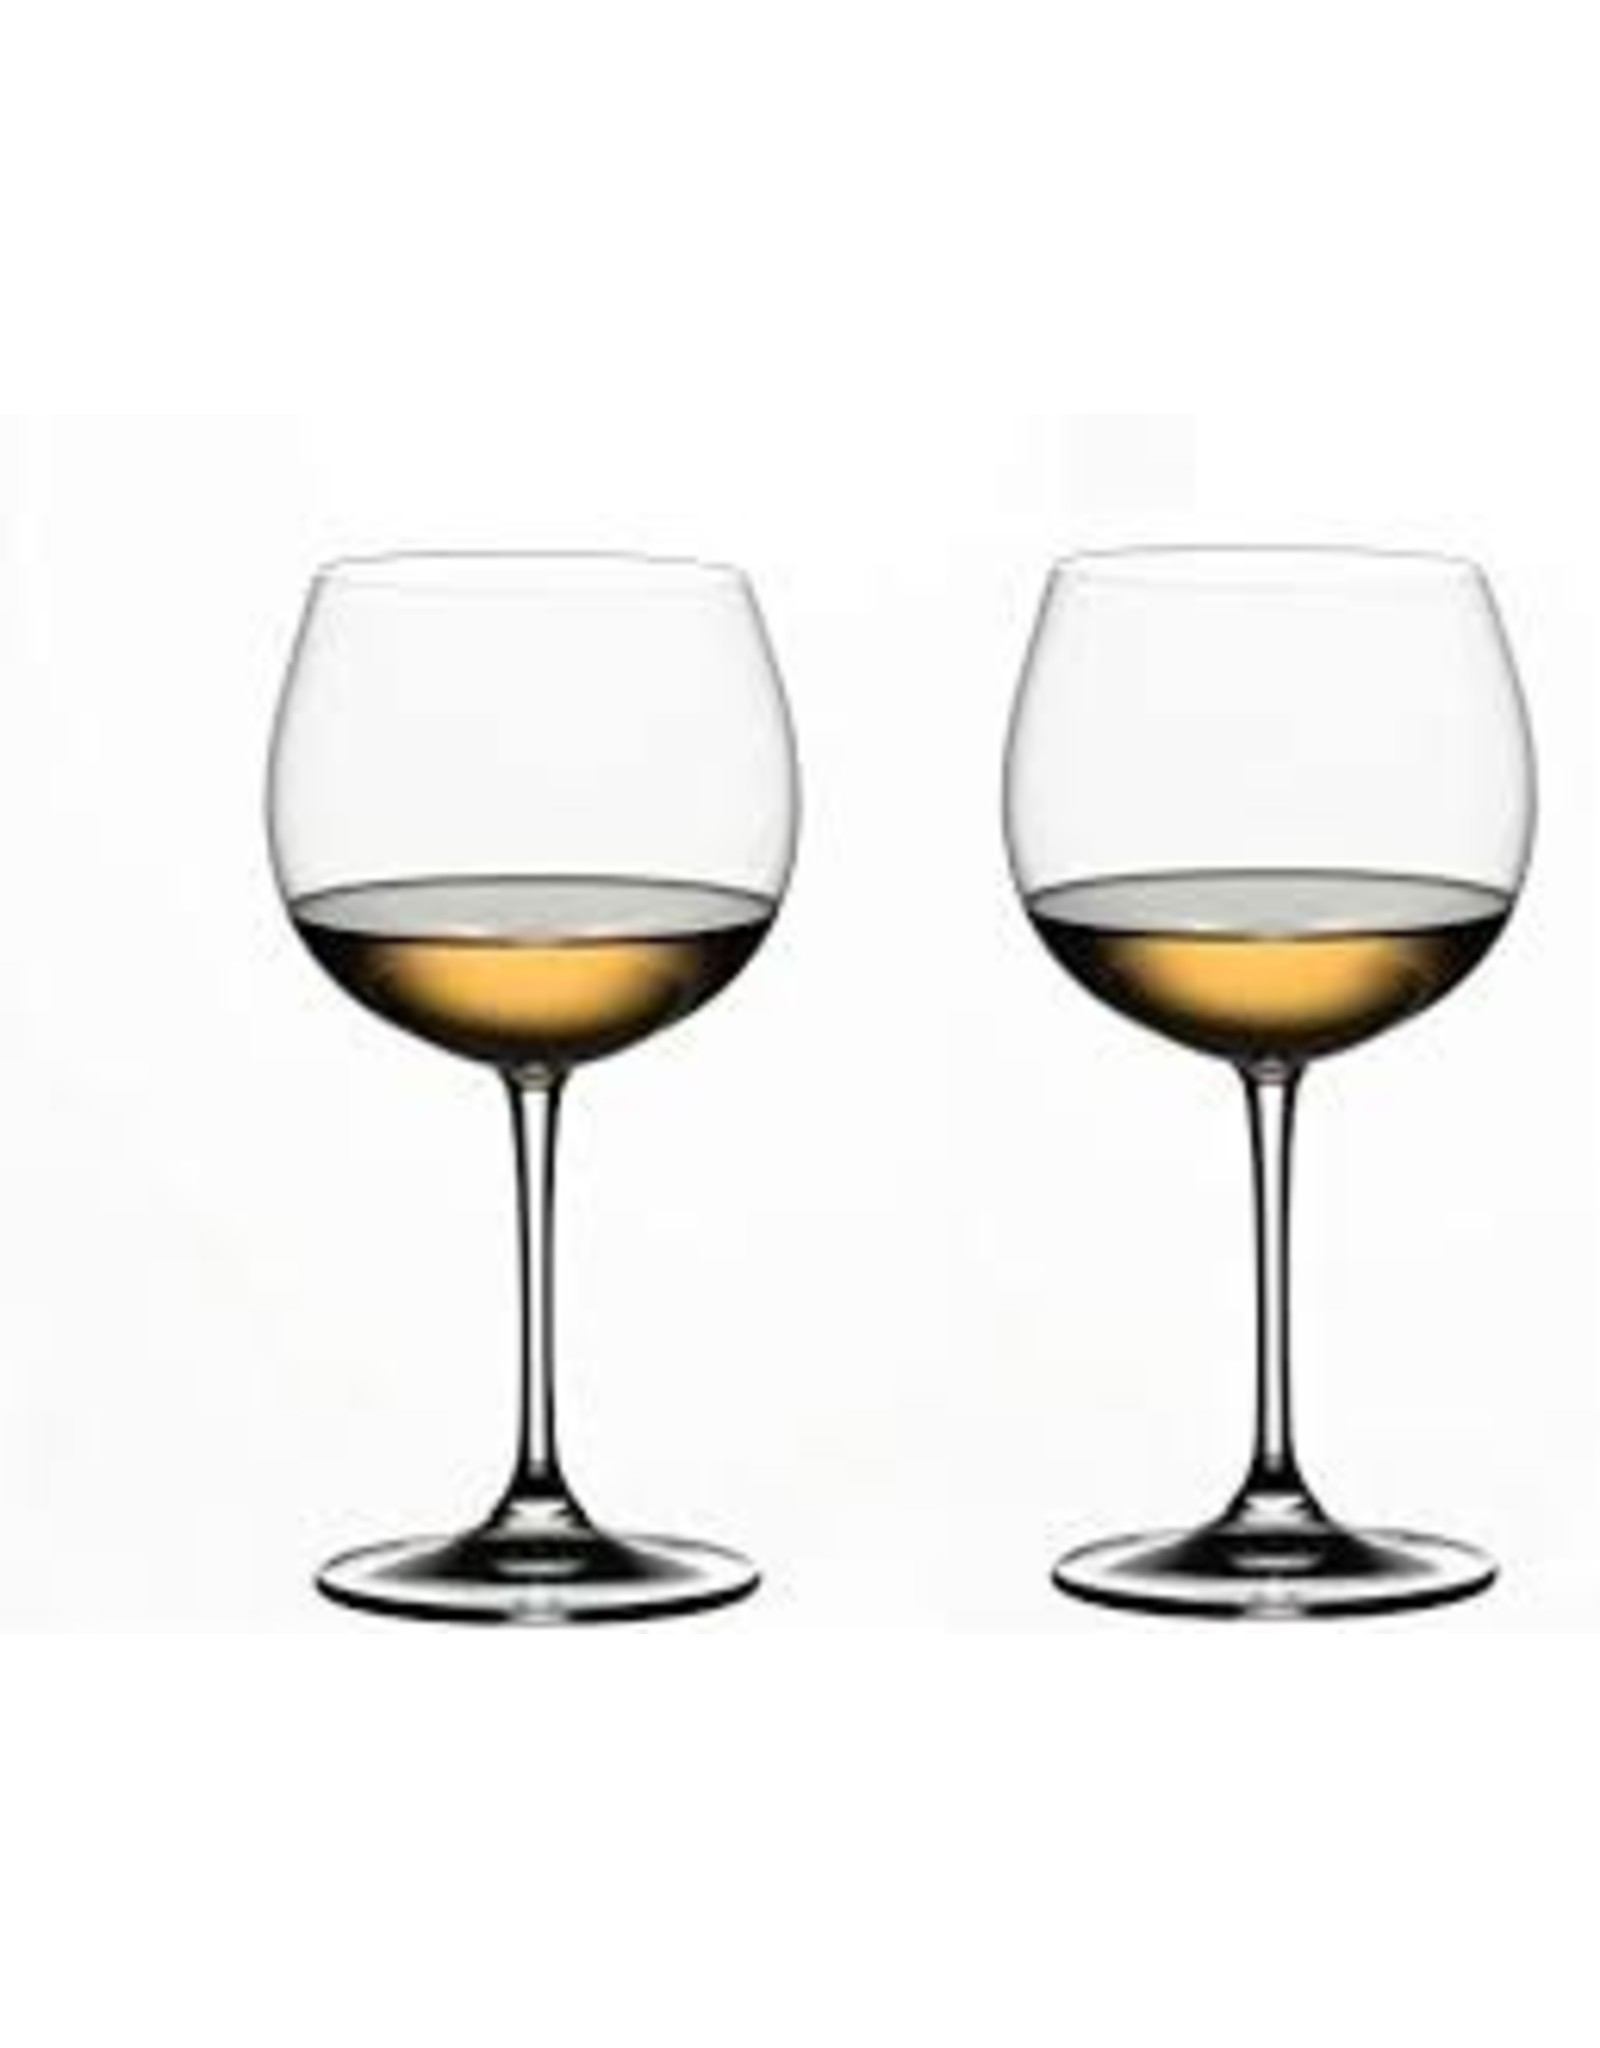 Riedel Riedel Vinum Oaked Chardonnay